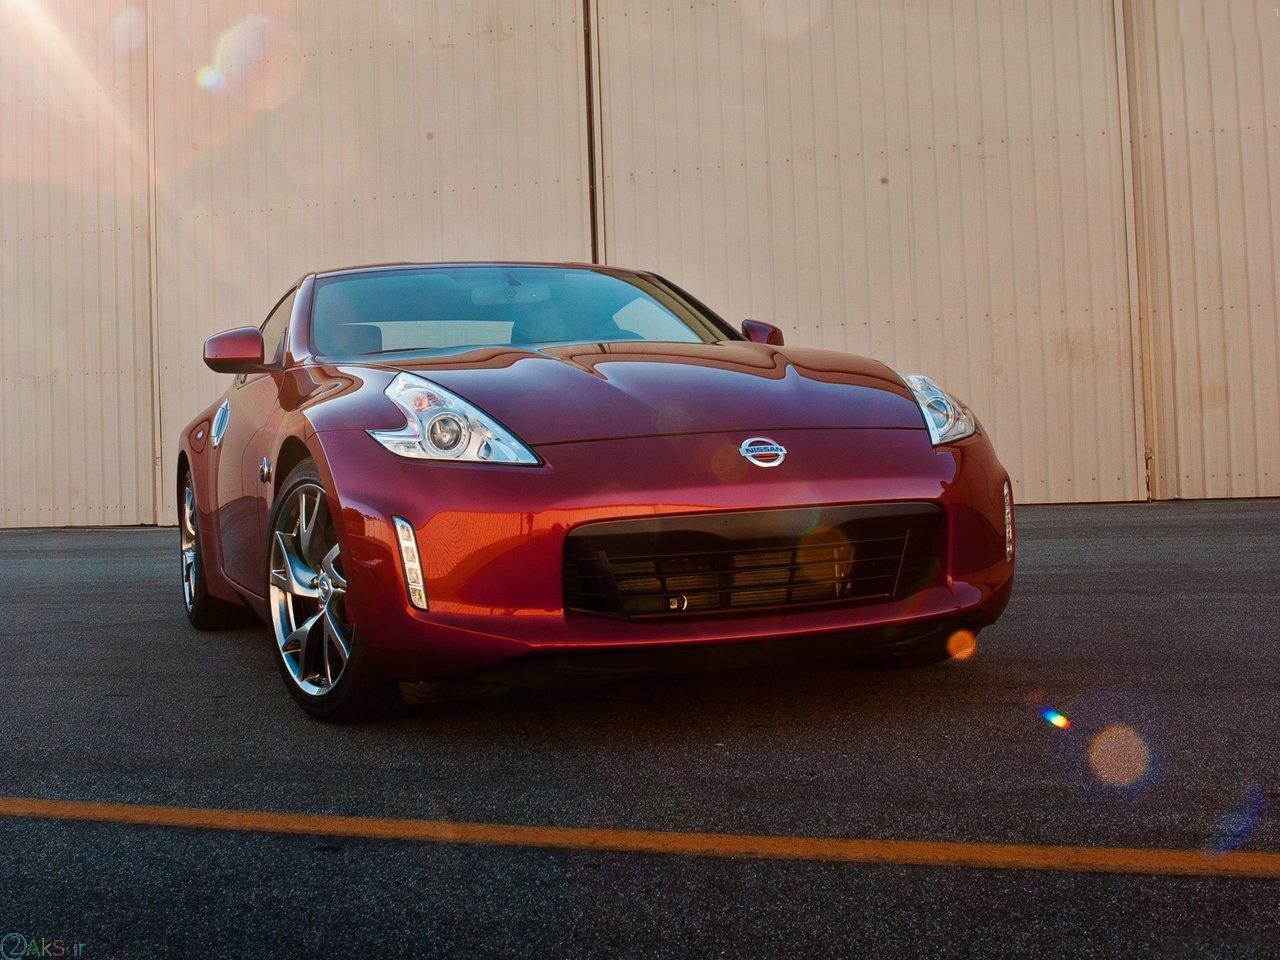 تصویر Nissan 370Z